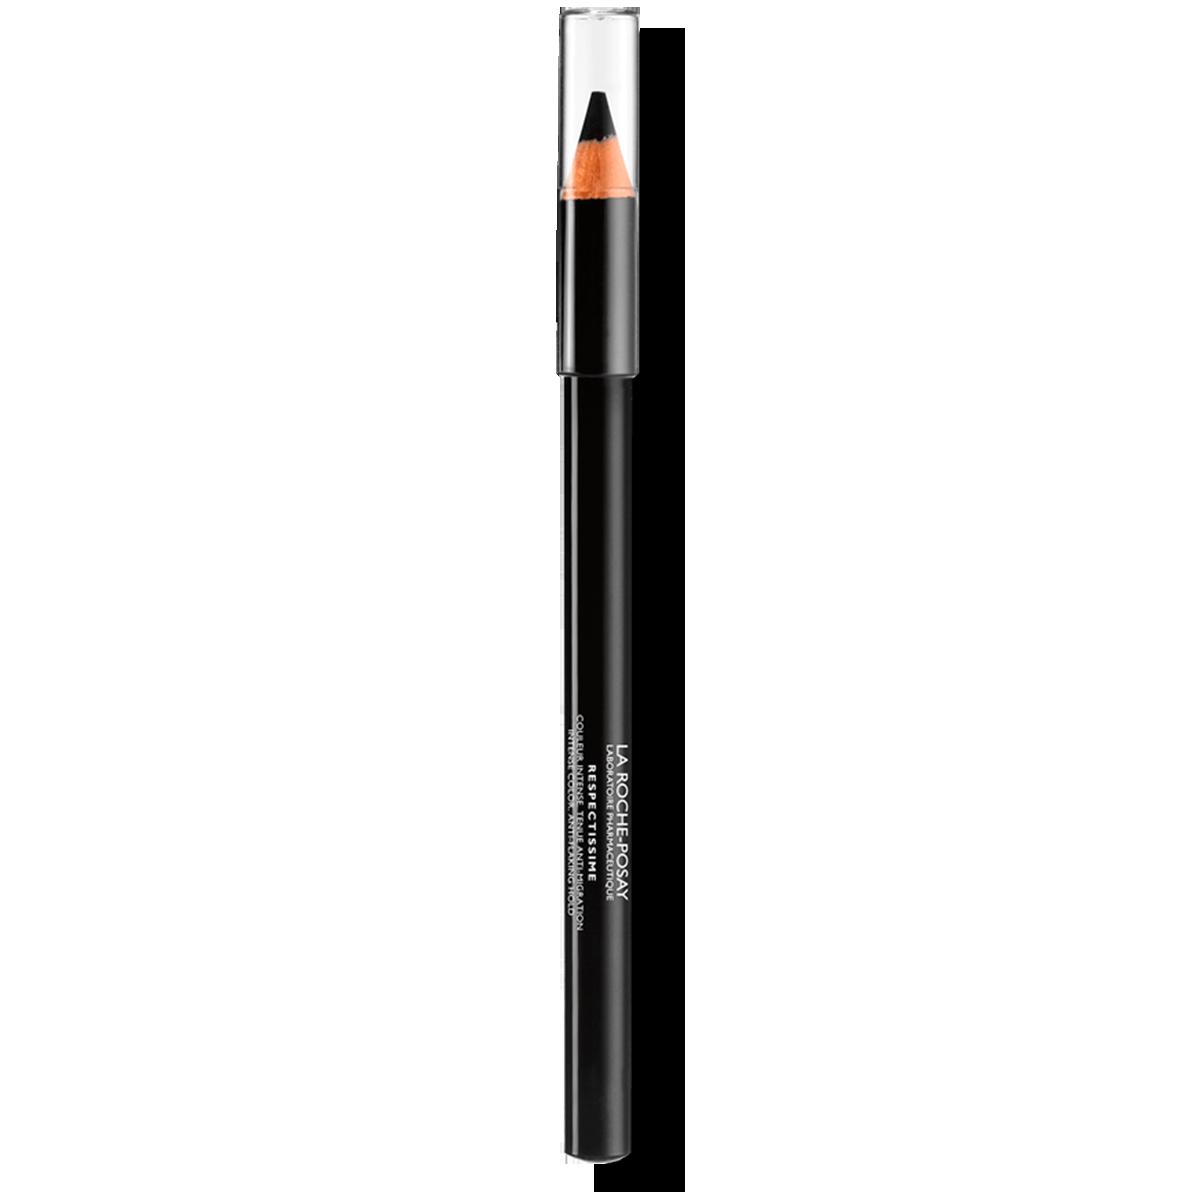 La Roche Posay Känslig Toleriane Make up EYE PENCIL Black 3337872410